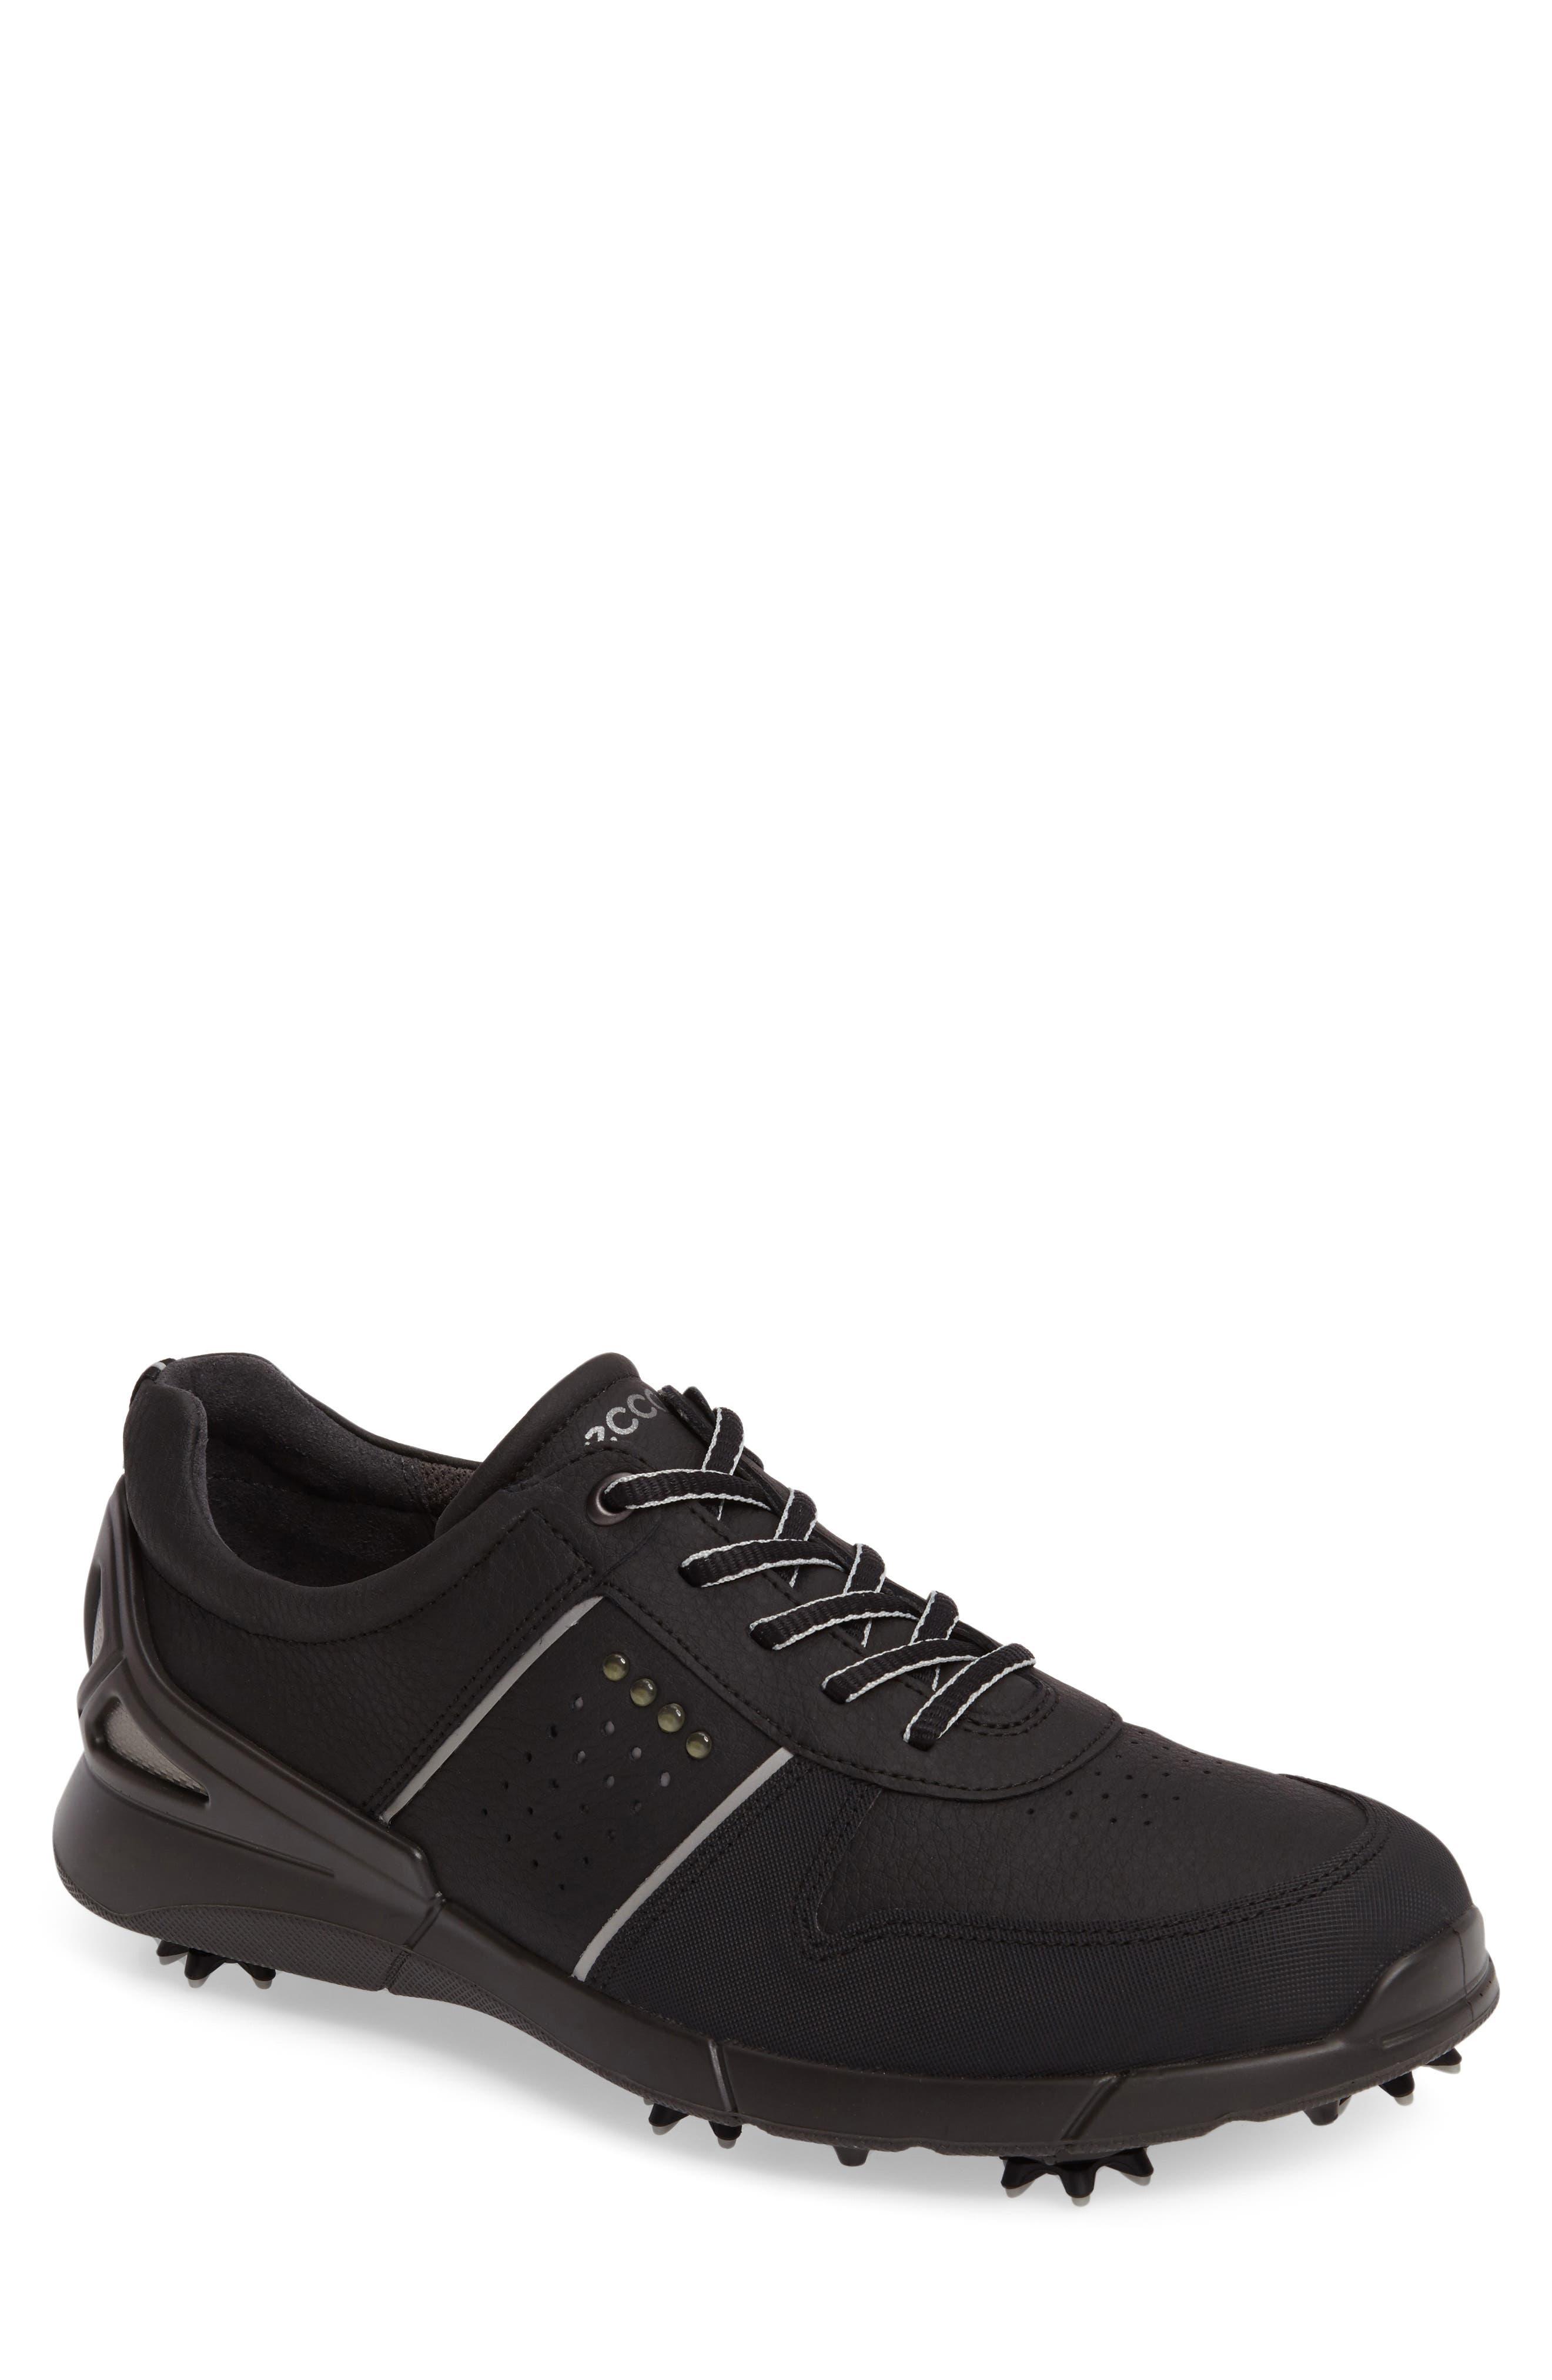 Base One Golf Shoe,                         Main,                         color, 001